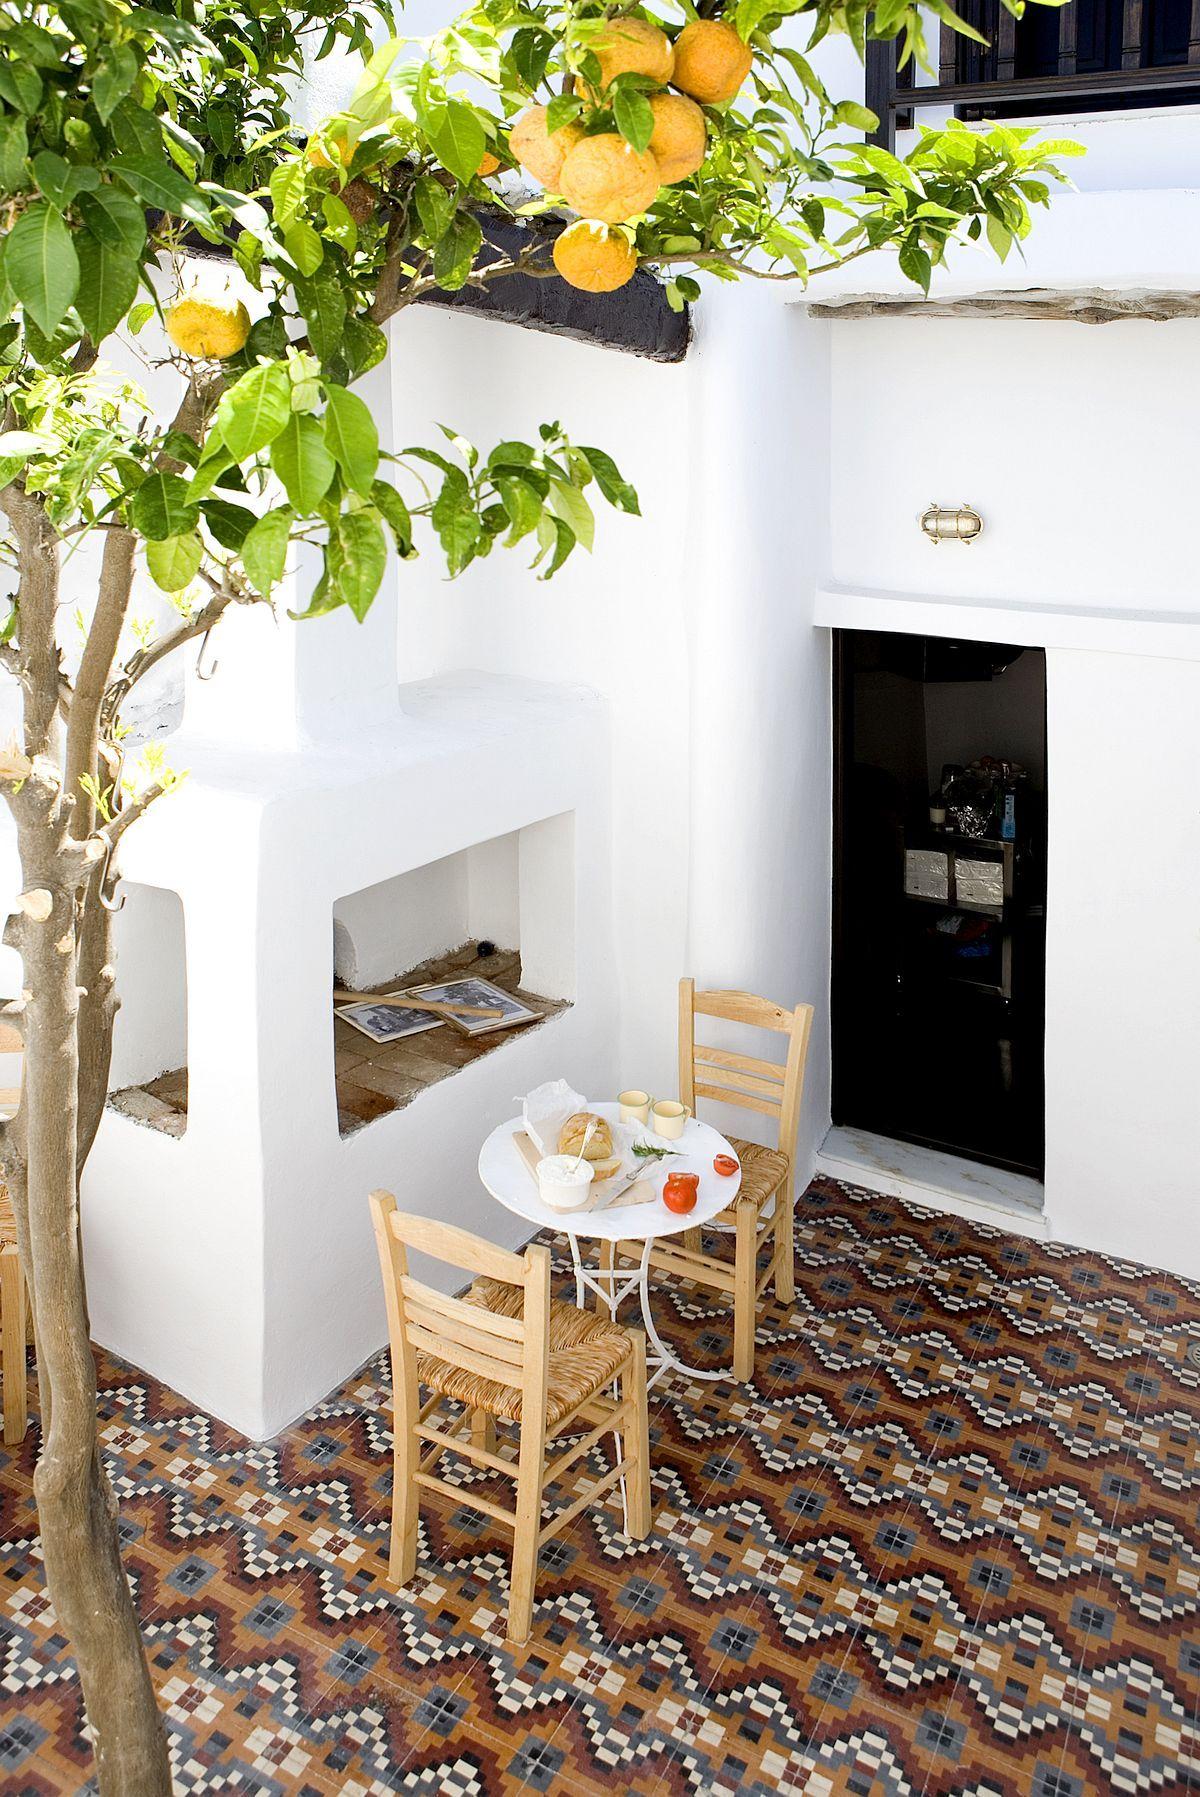 Small Courtyard With Orange Tree | Outdoor Spaces | Pinterest ... Ideen Fur Zimmerpflanzen Winterdepression Bekampfen